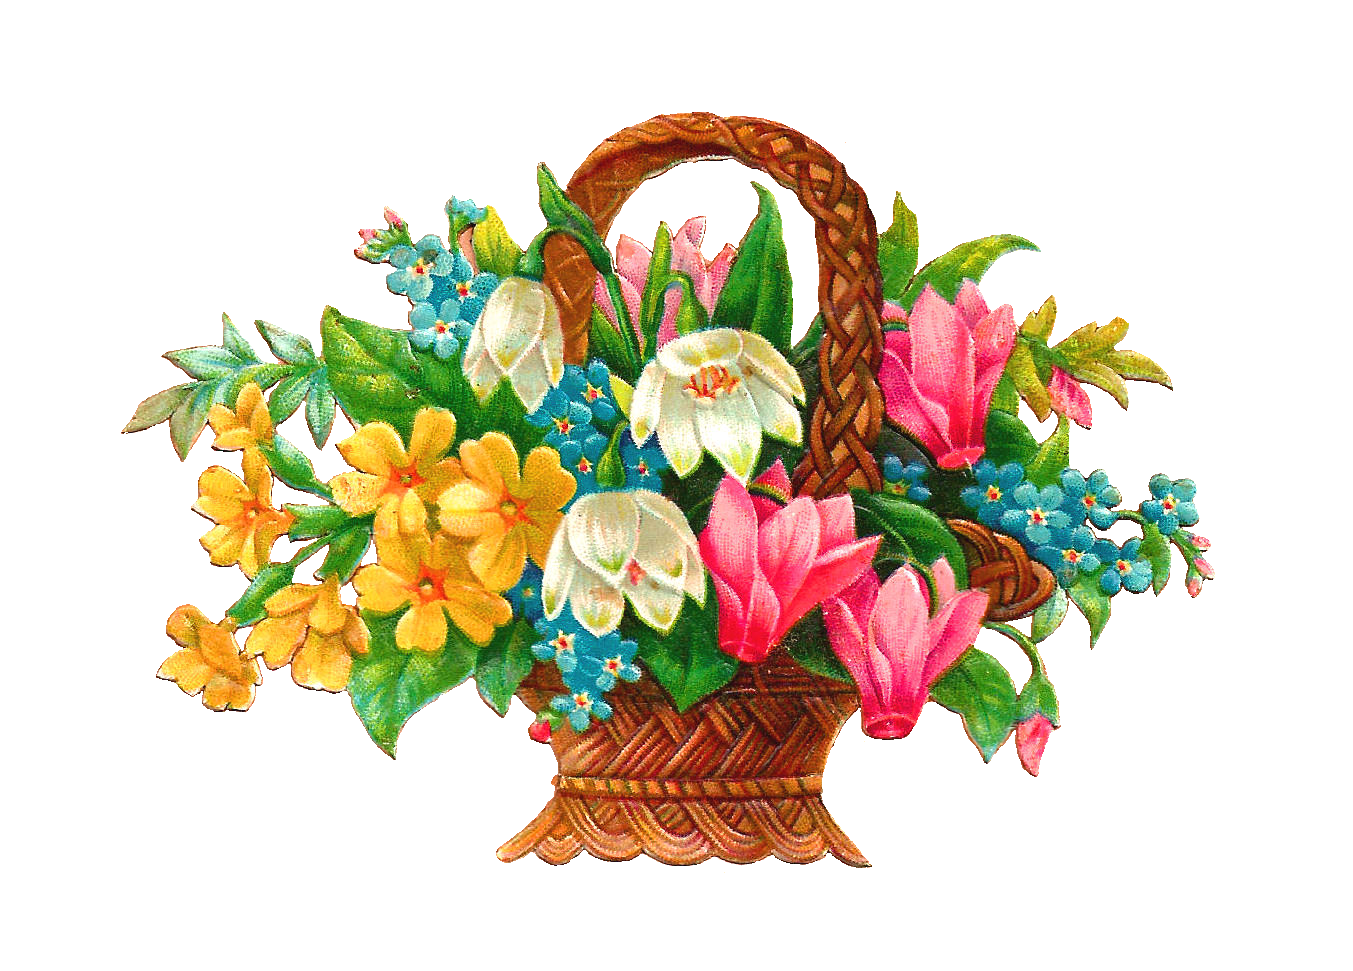 1353x971 Antique Images Free Flower Basket Clip Art 2 Wicket Baskets Full